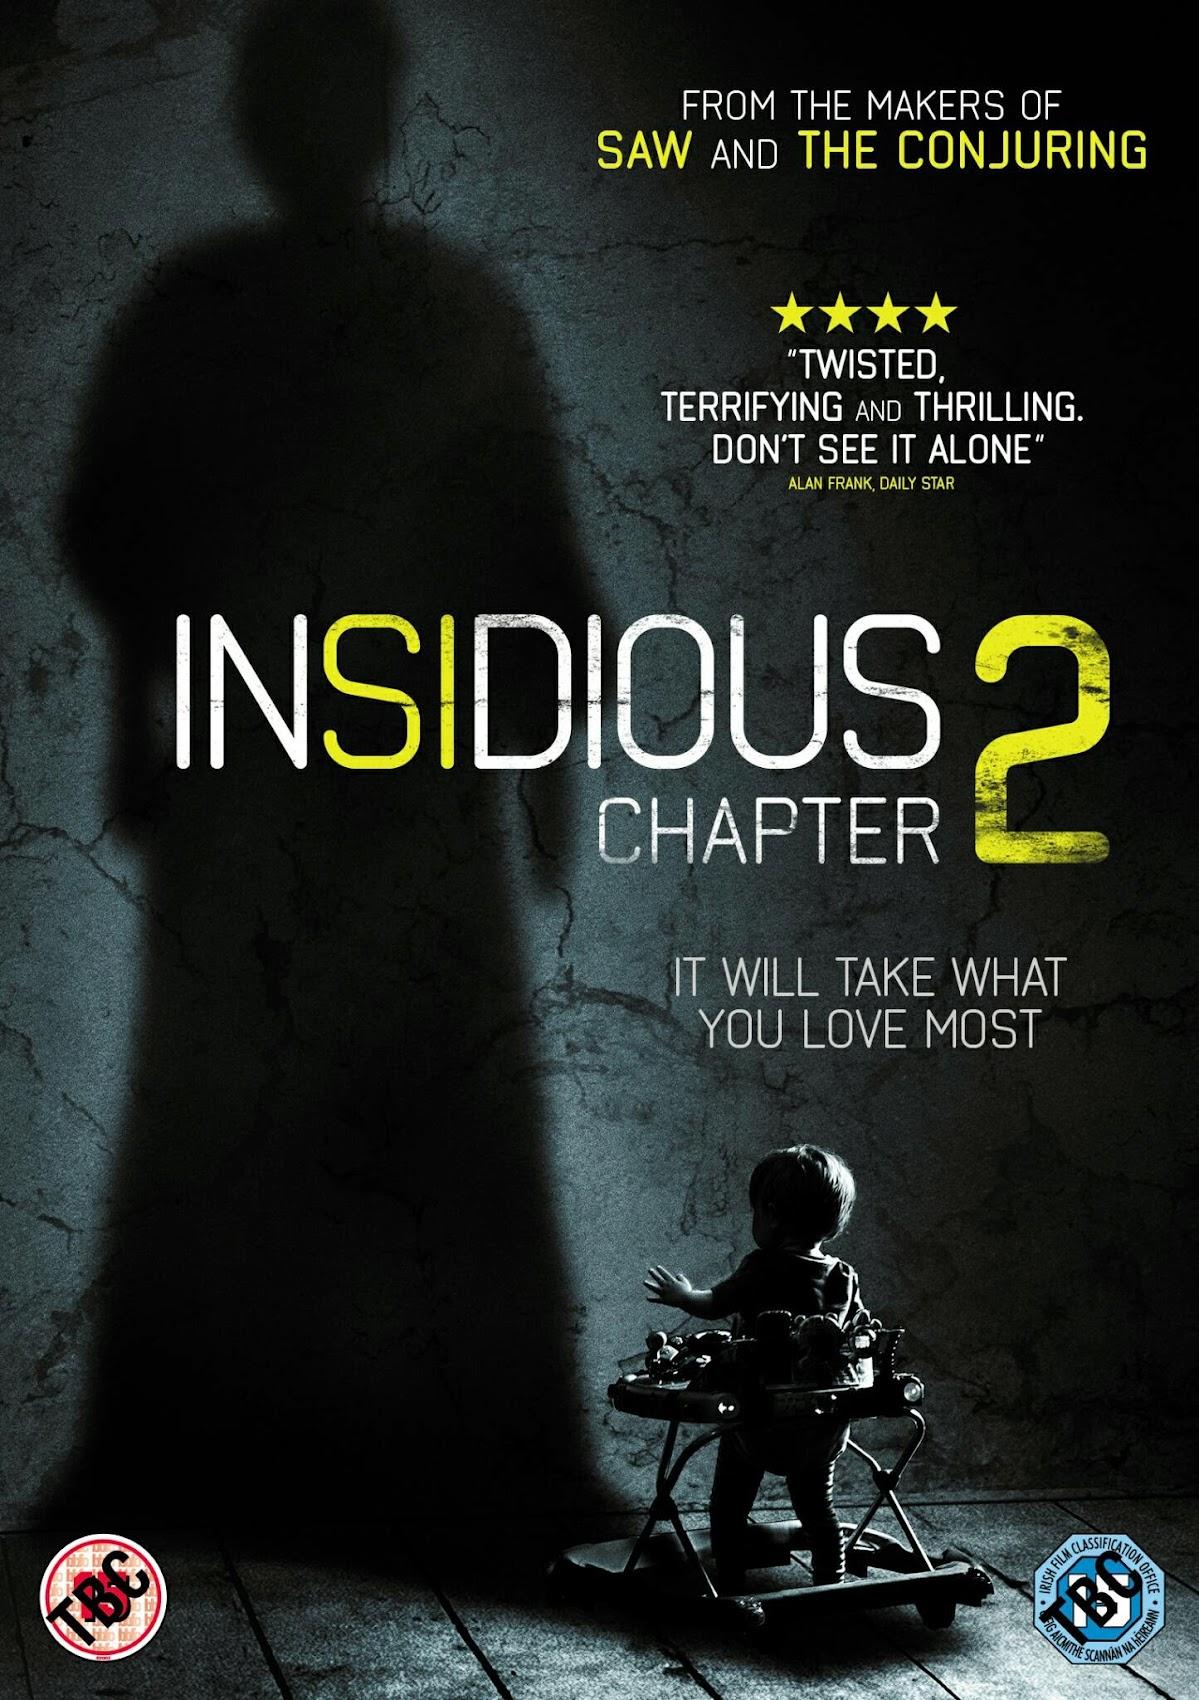 http://lh6.ggpht.com/-kQ2RUGVZq0o/Unu79zJvlvI/AAAAAAAACi4/TFX5xPCaKFQ/s1700/Insidious2_DVD_2D.jpg